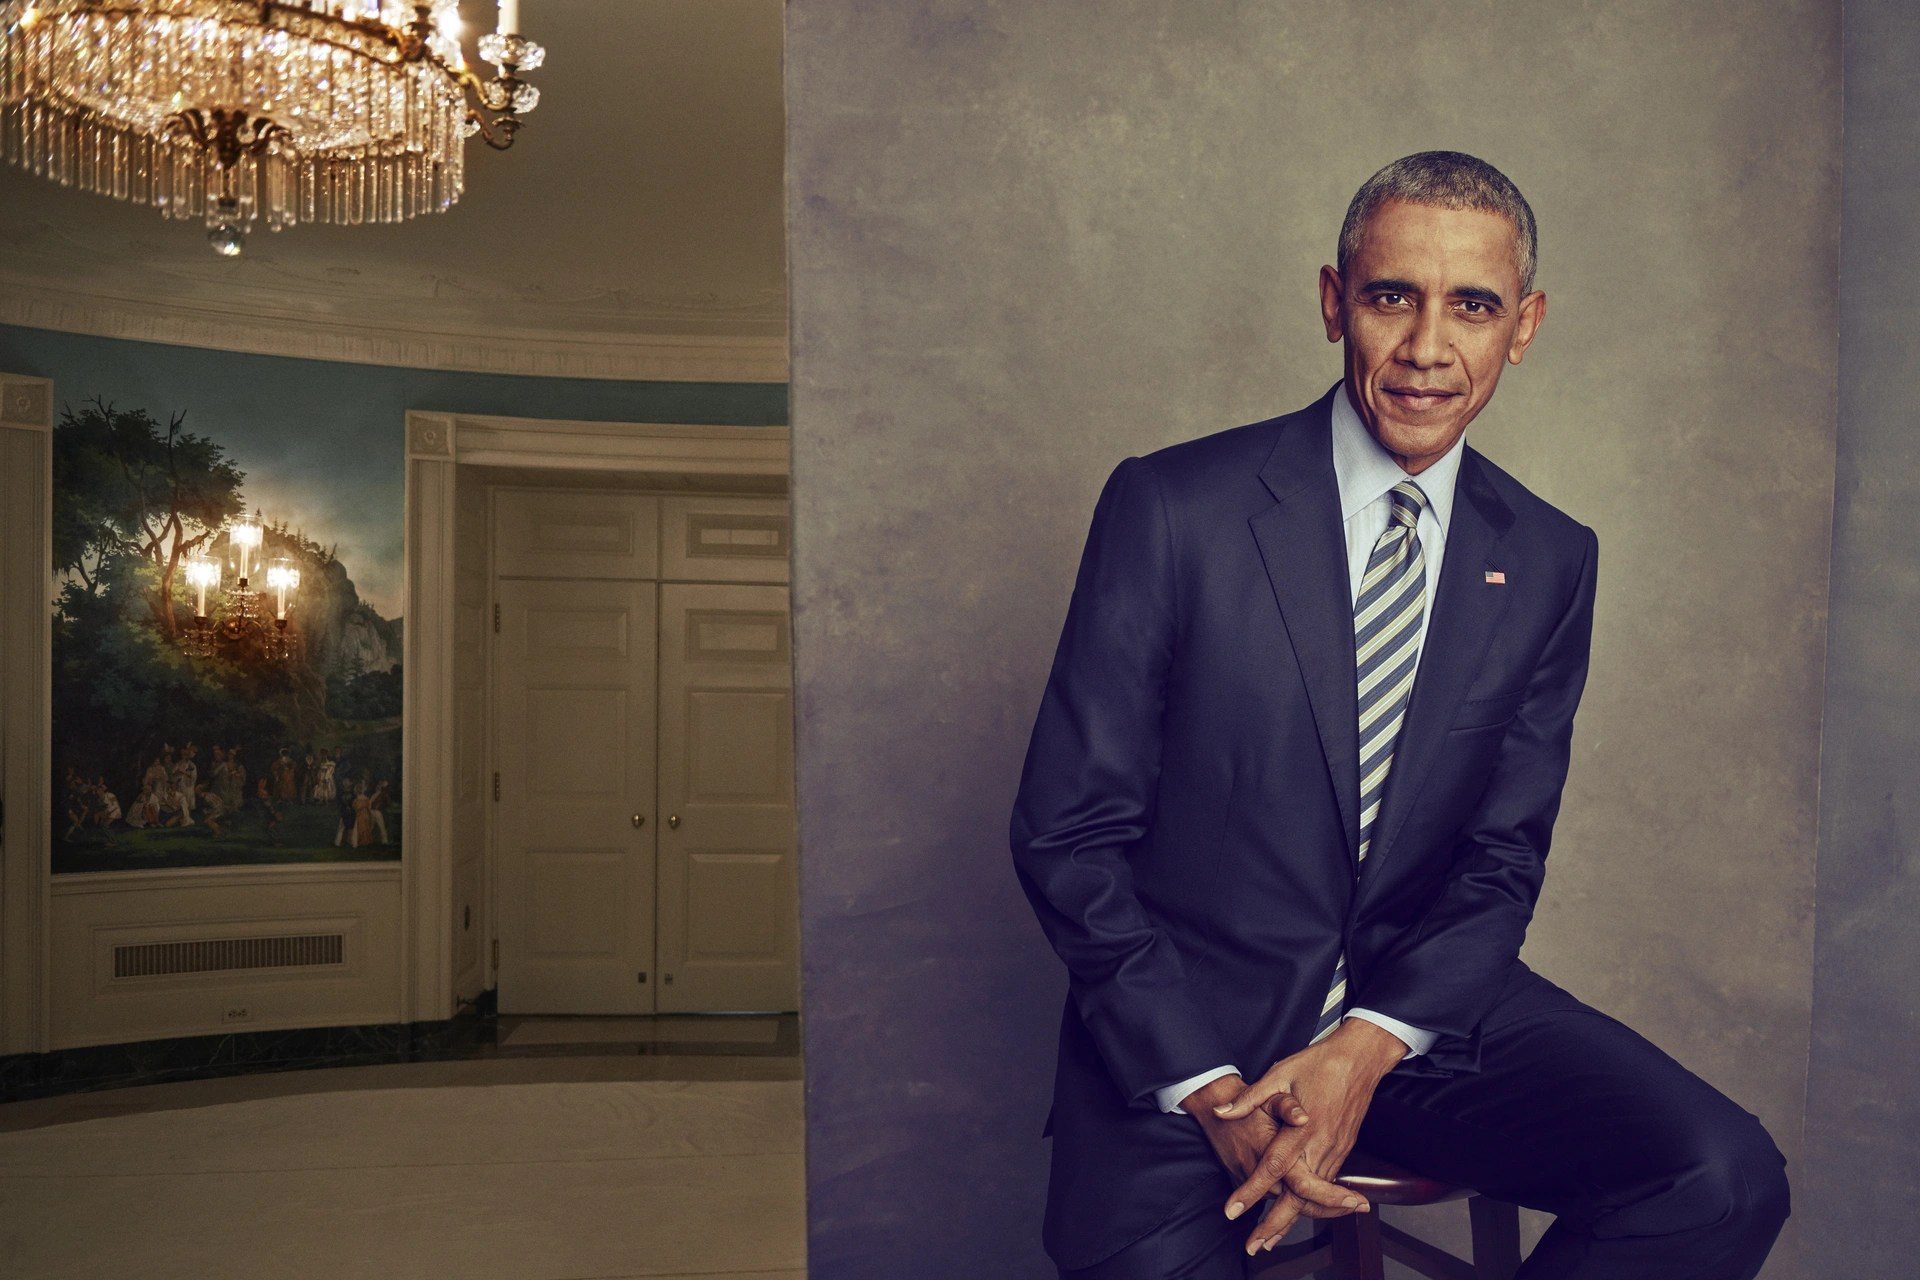 President Obama S Interview With Jeffrey Goldberg On Syria